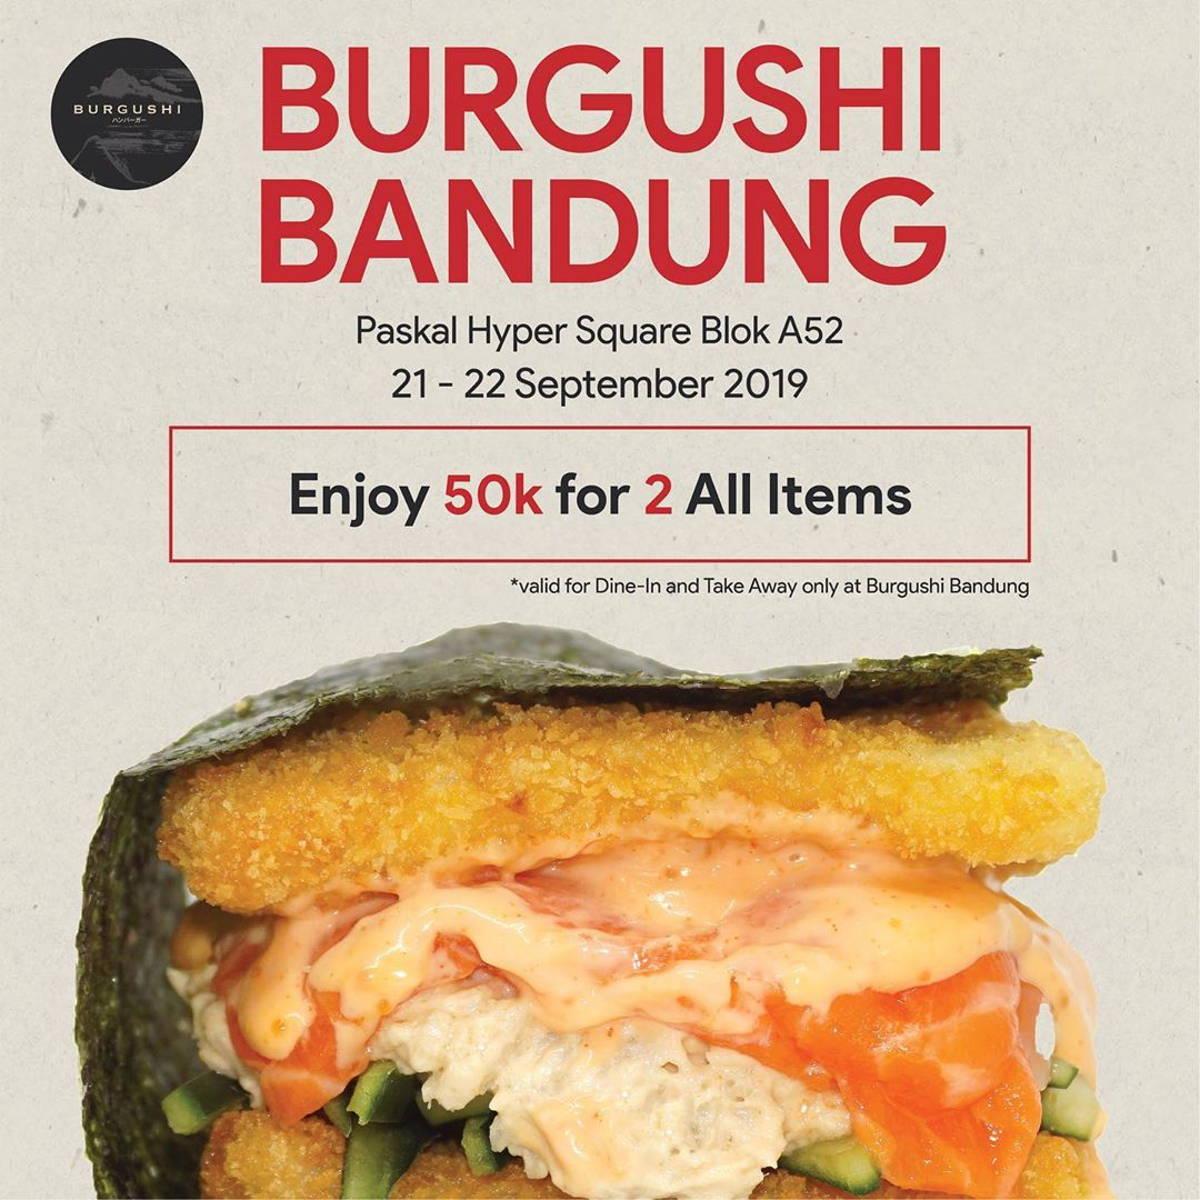 Katalog Promo: BURGUSHI Bandung: PROMO Grand Opening Enjoy 50k for All 2 Items - 1